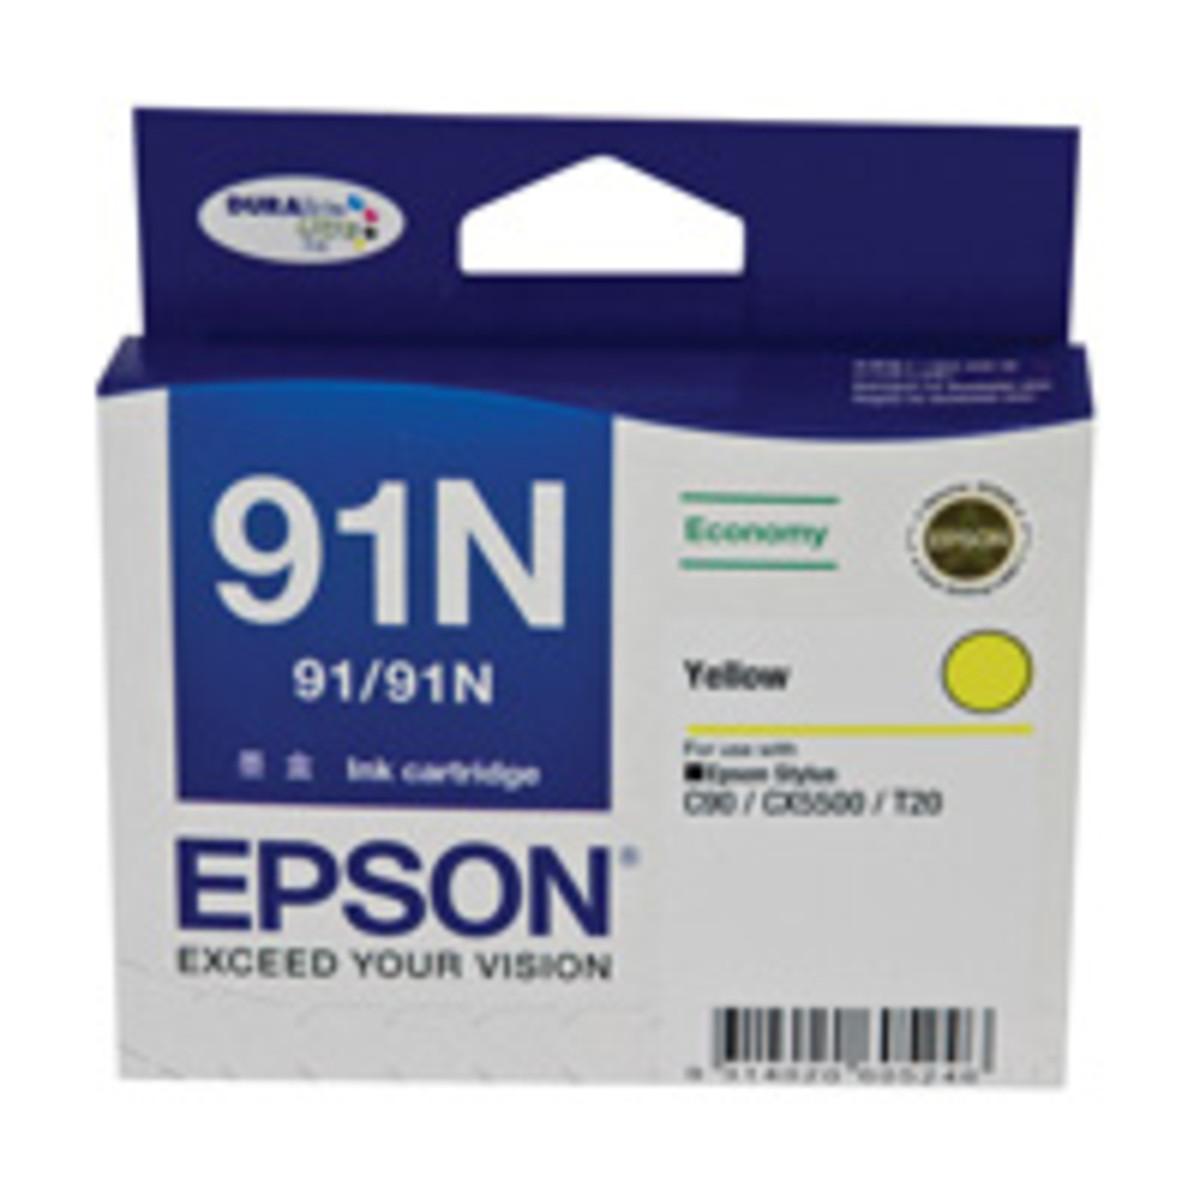 Epson 91N Yellow Ink Cartridge